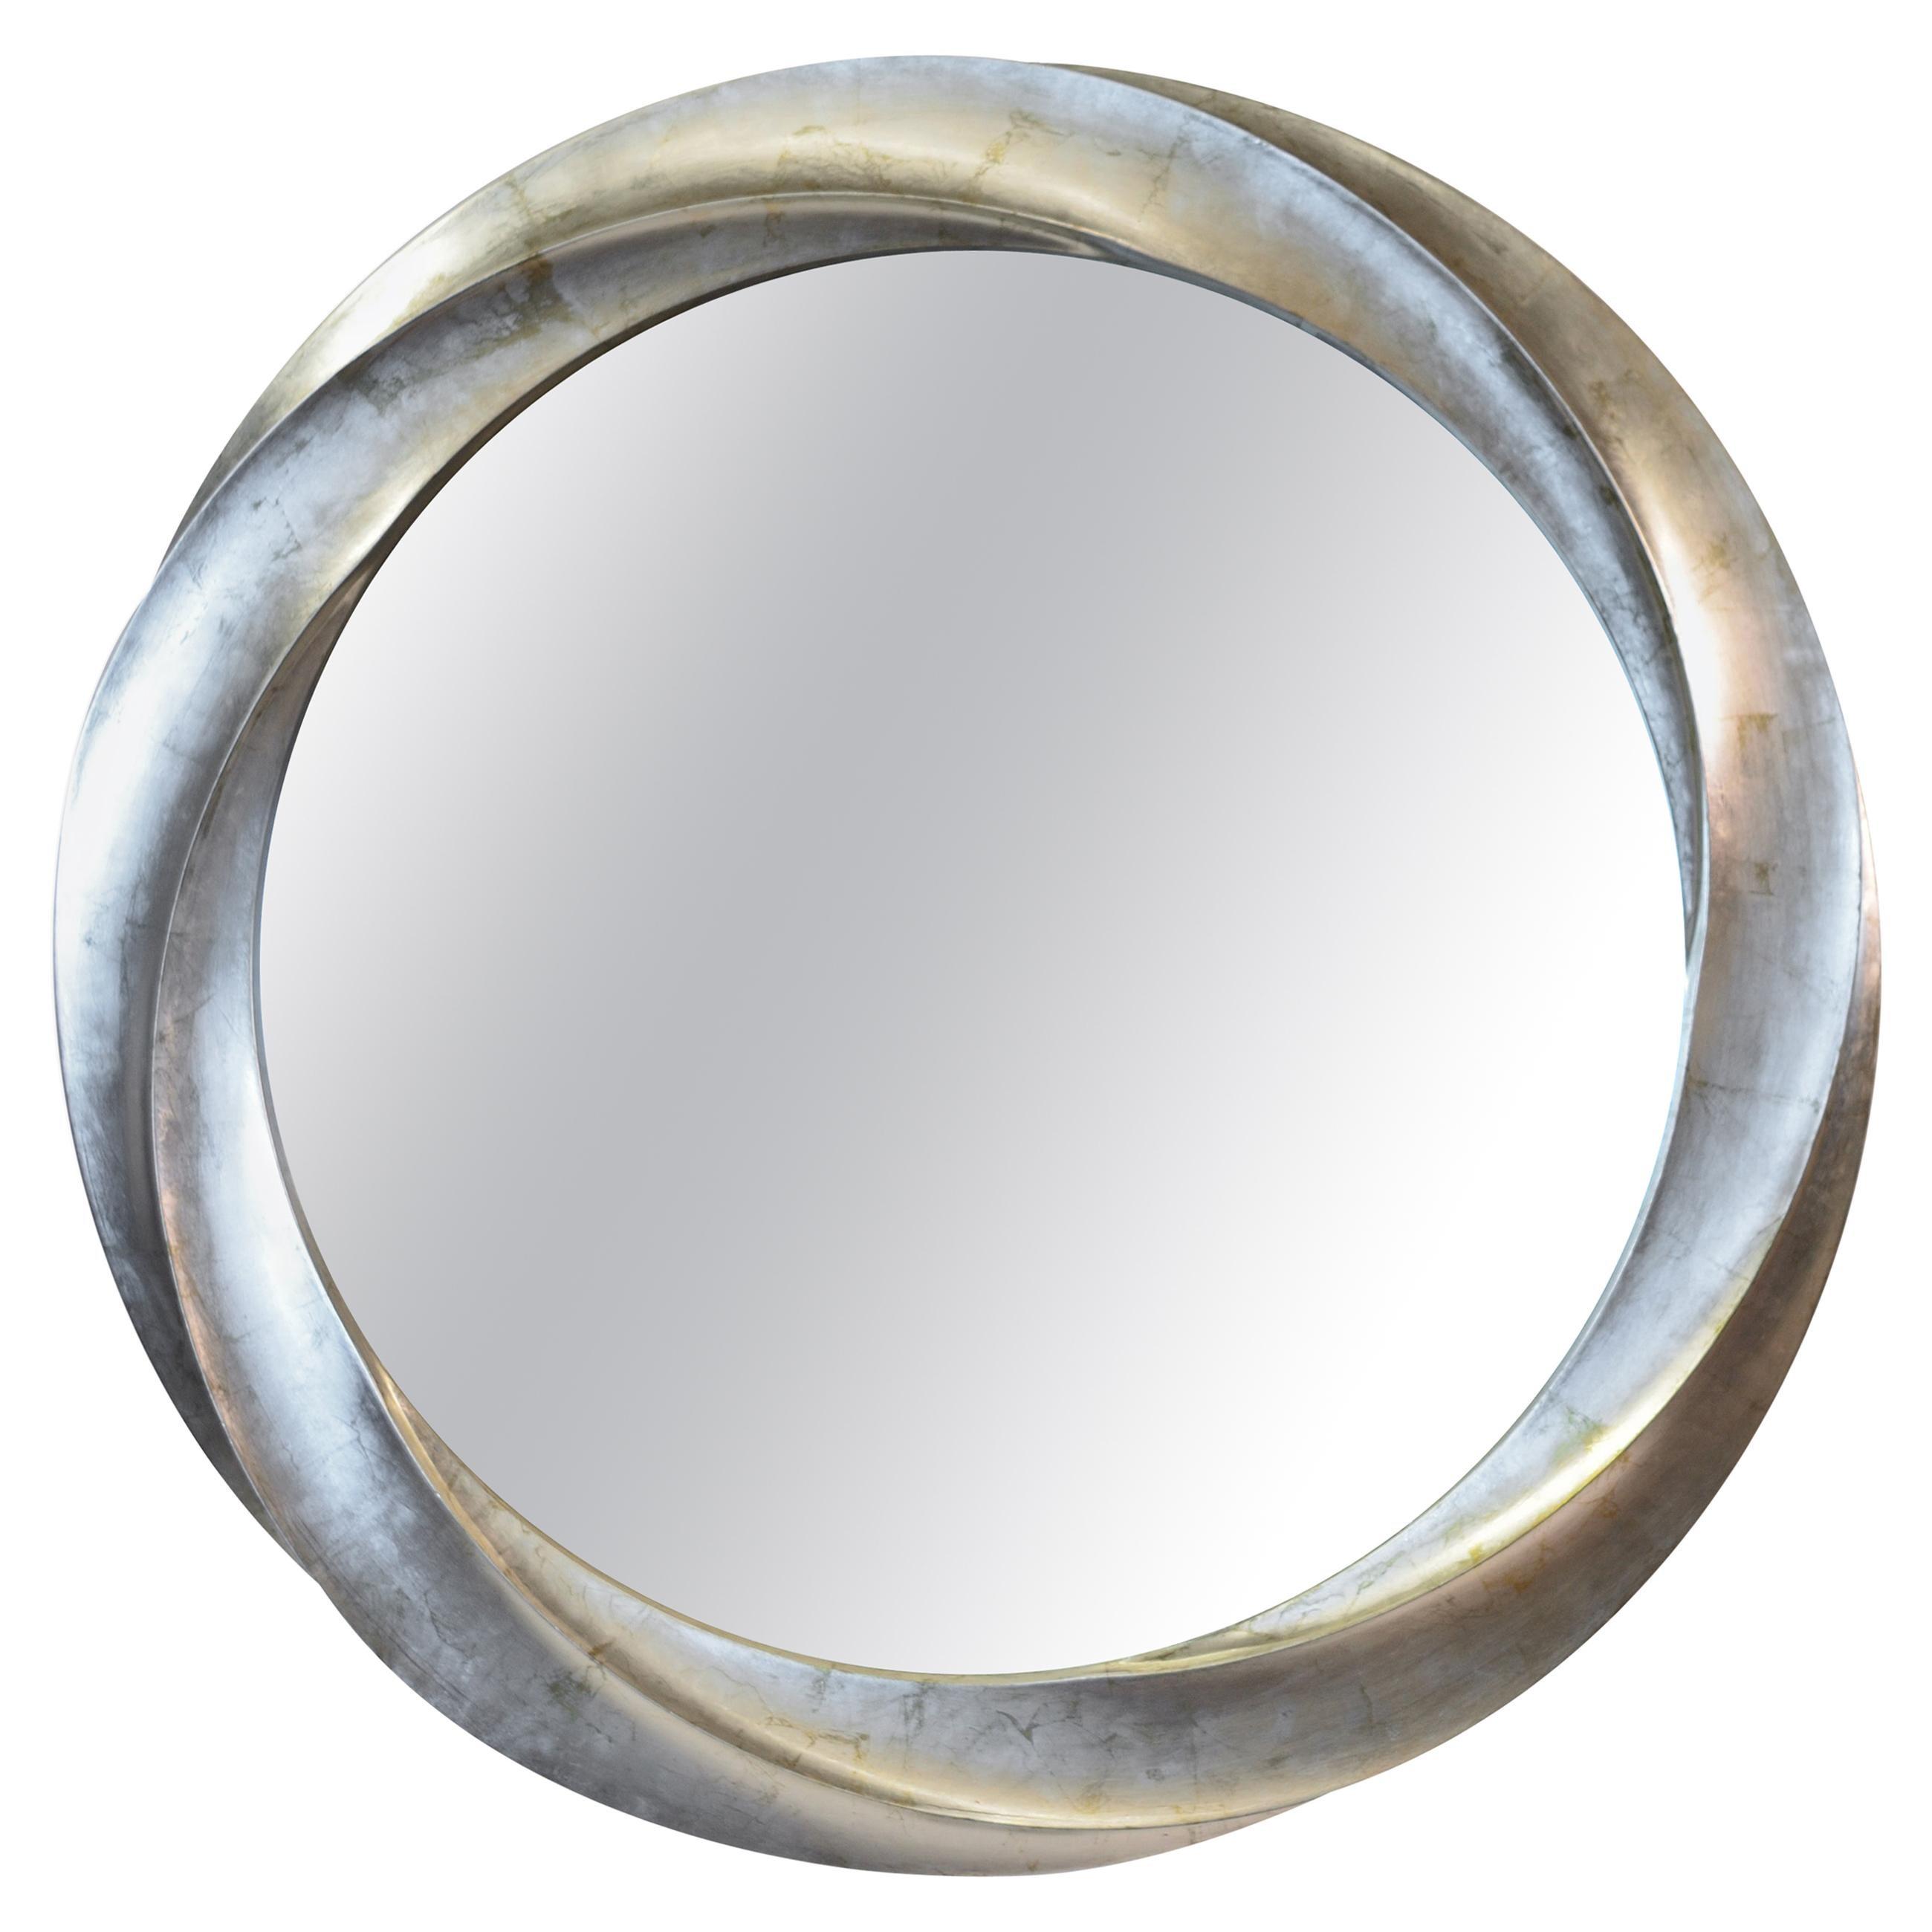 Wave series Mirror in Two-Tone Italian Silver Leaf